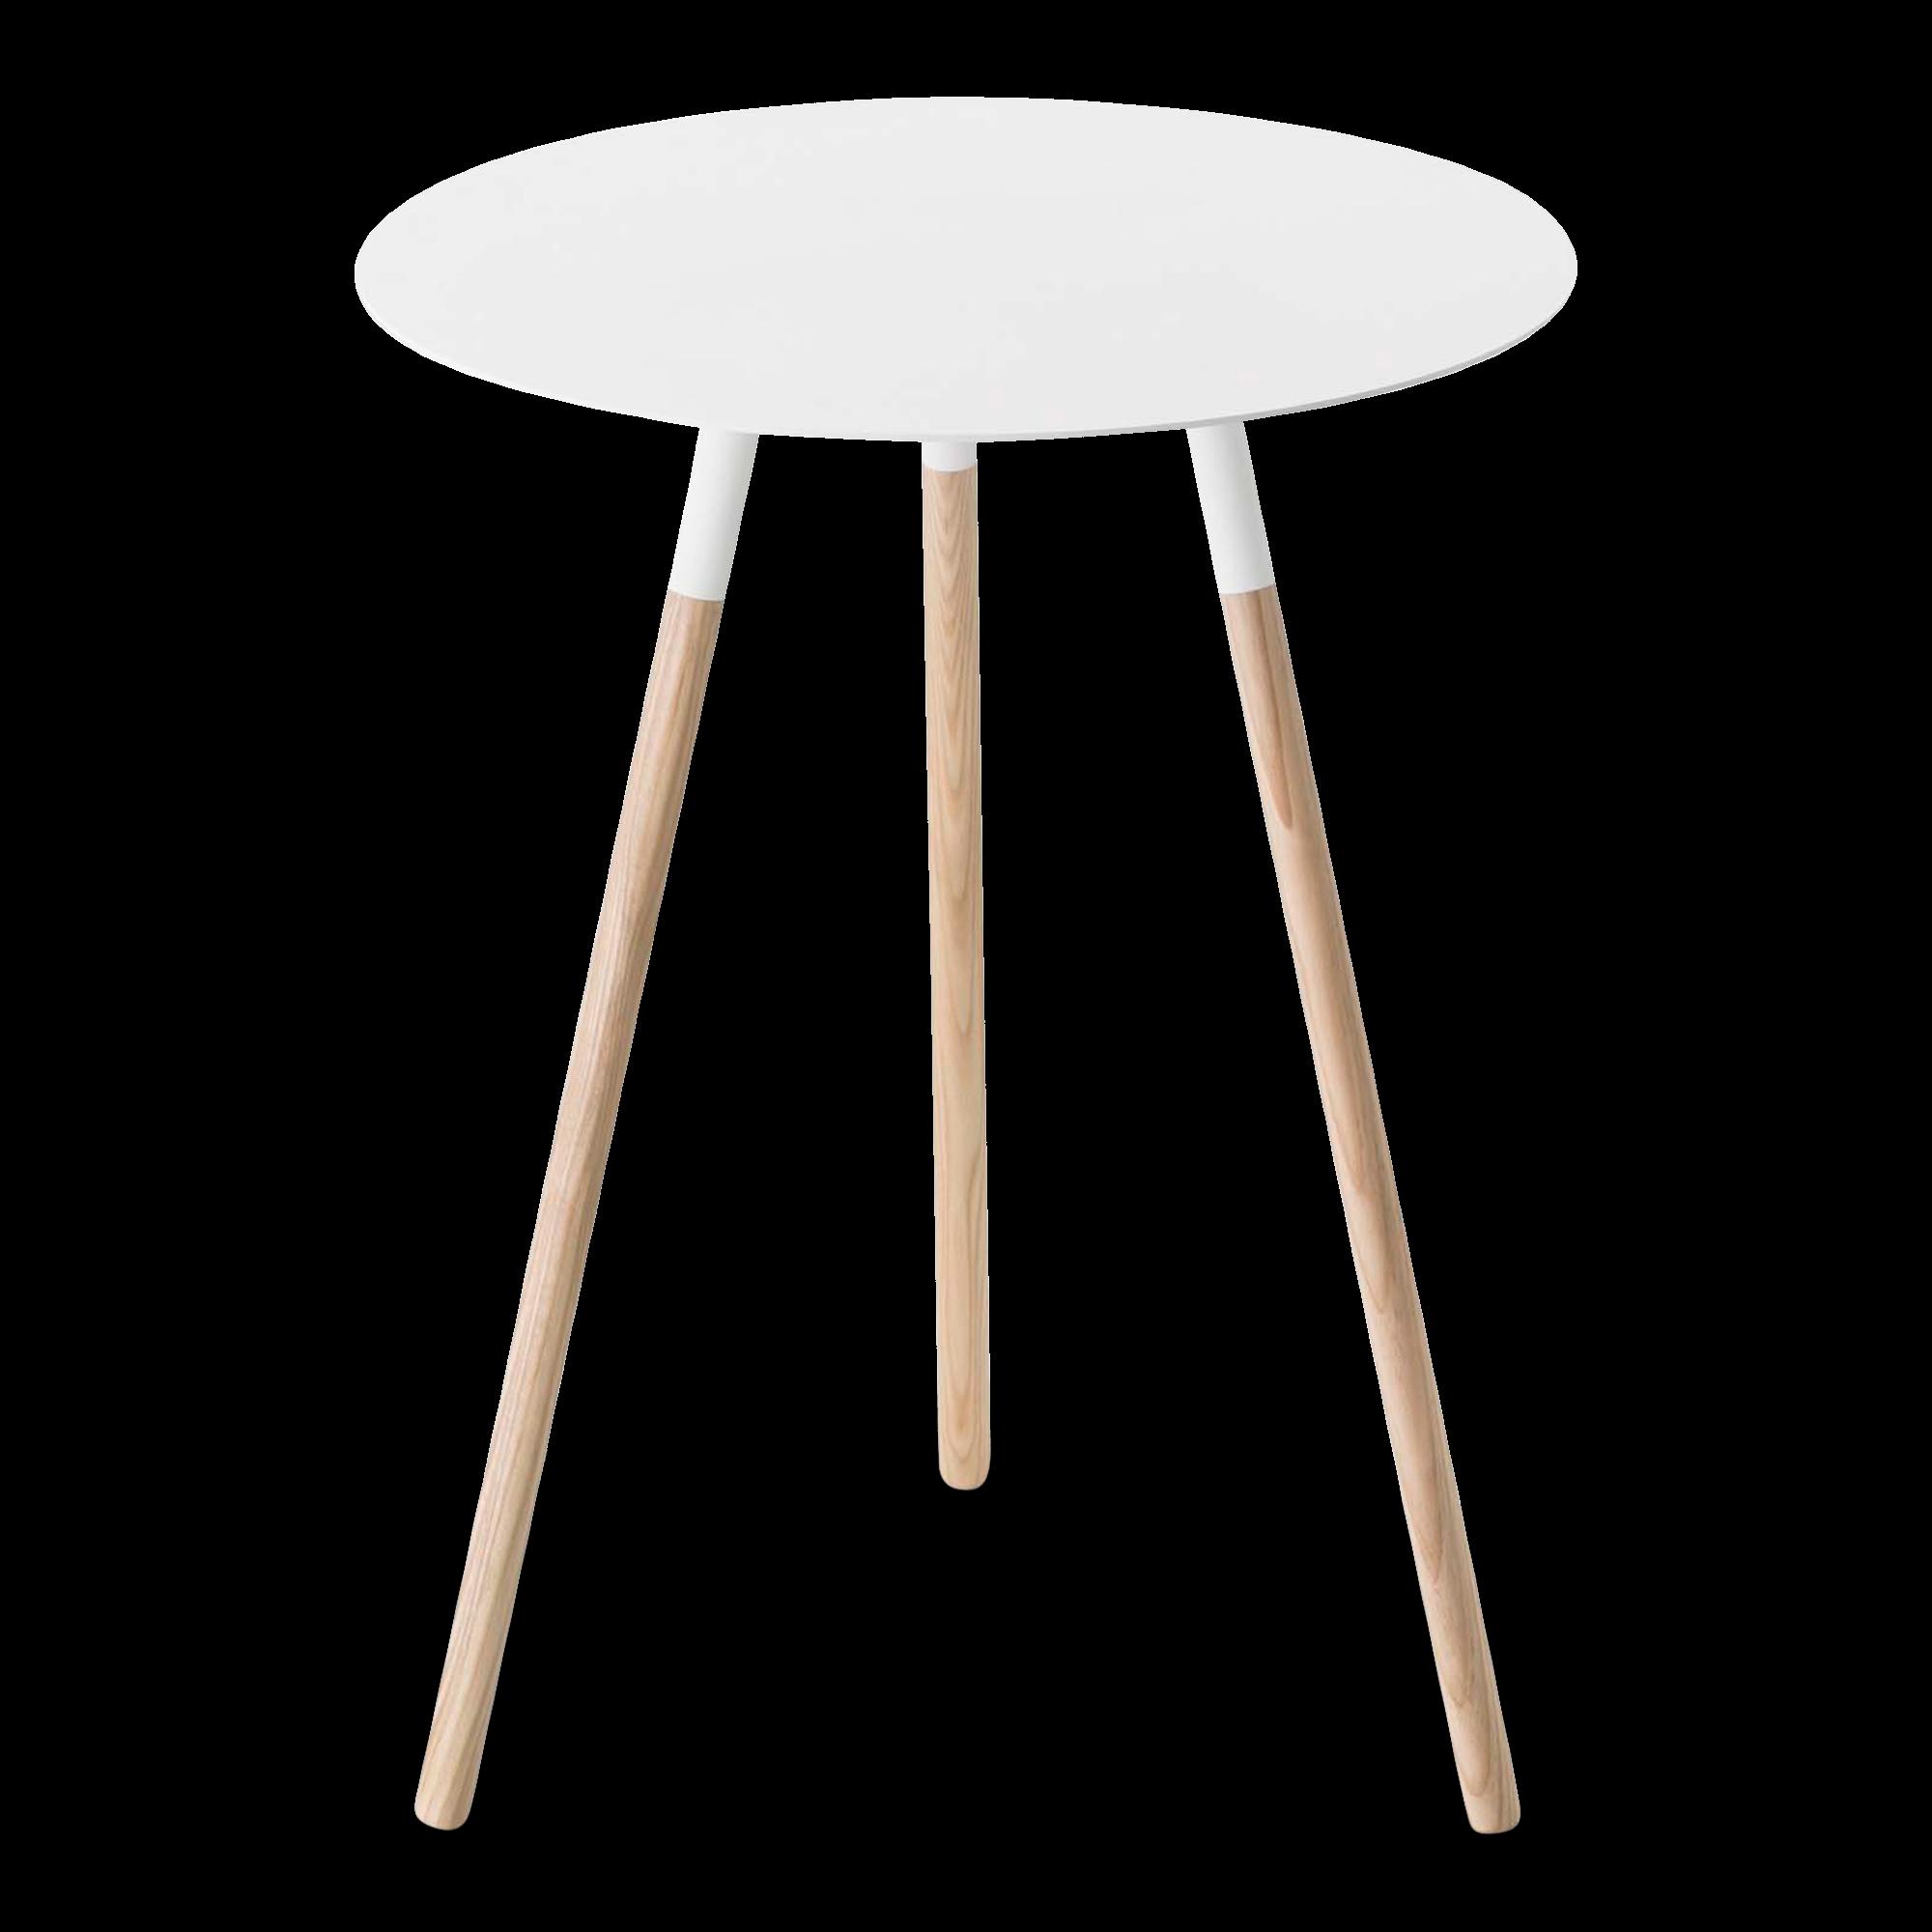 Table Ronde Bois Blanc: Plain Round Side Table, White